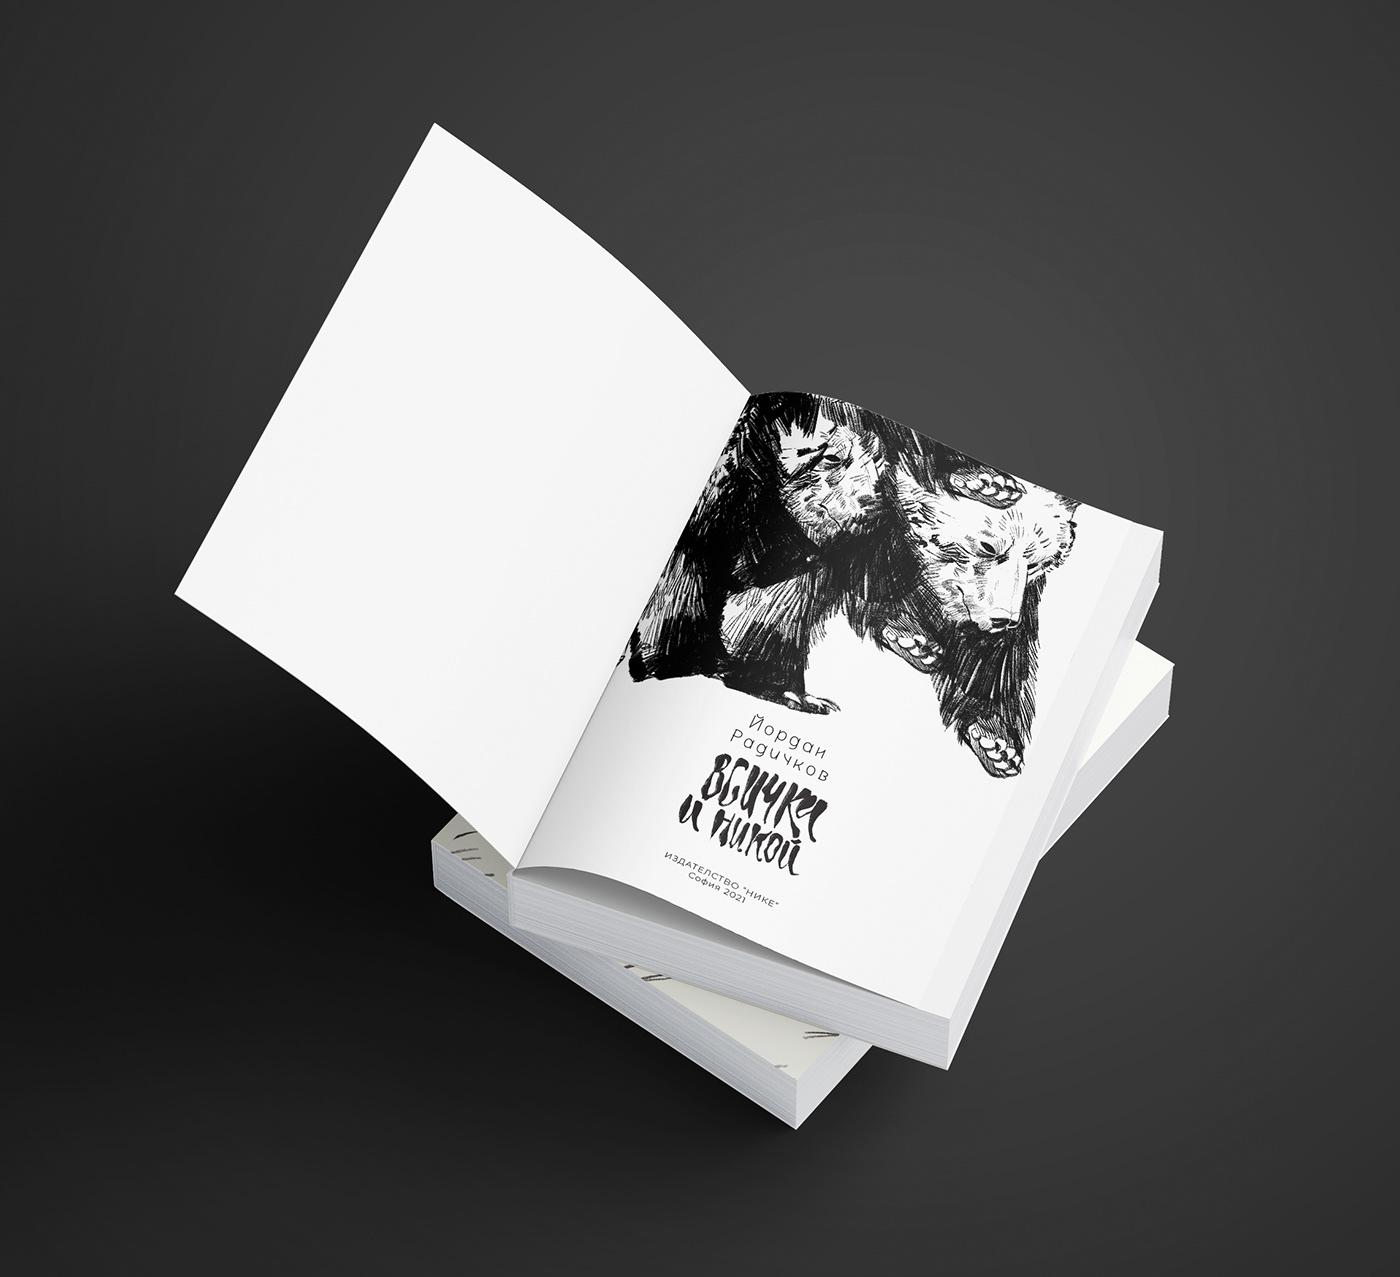 book Book Cover Design Drawing  graphic design  ILLUSTRATION  Procreate Drawing Yordan Radichkov Ива Димитрова Йордан Радичков